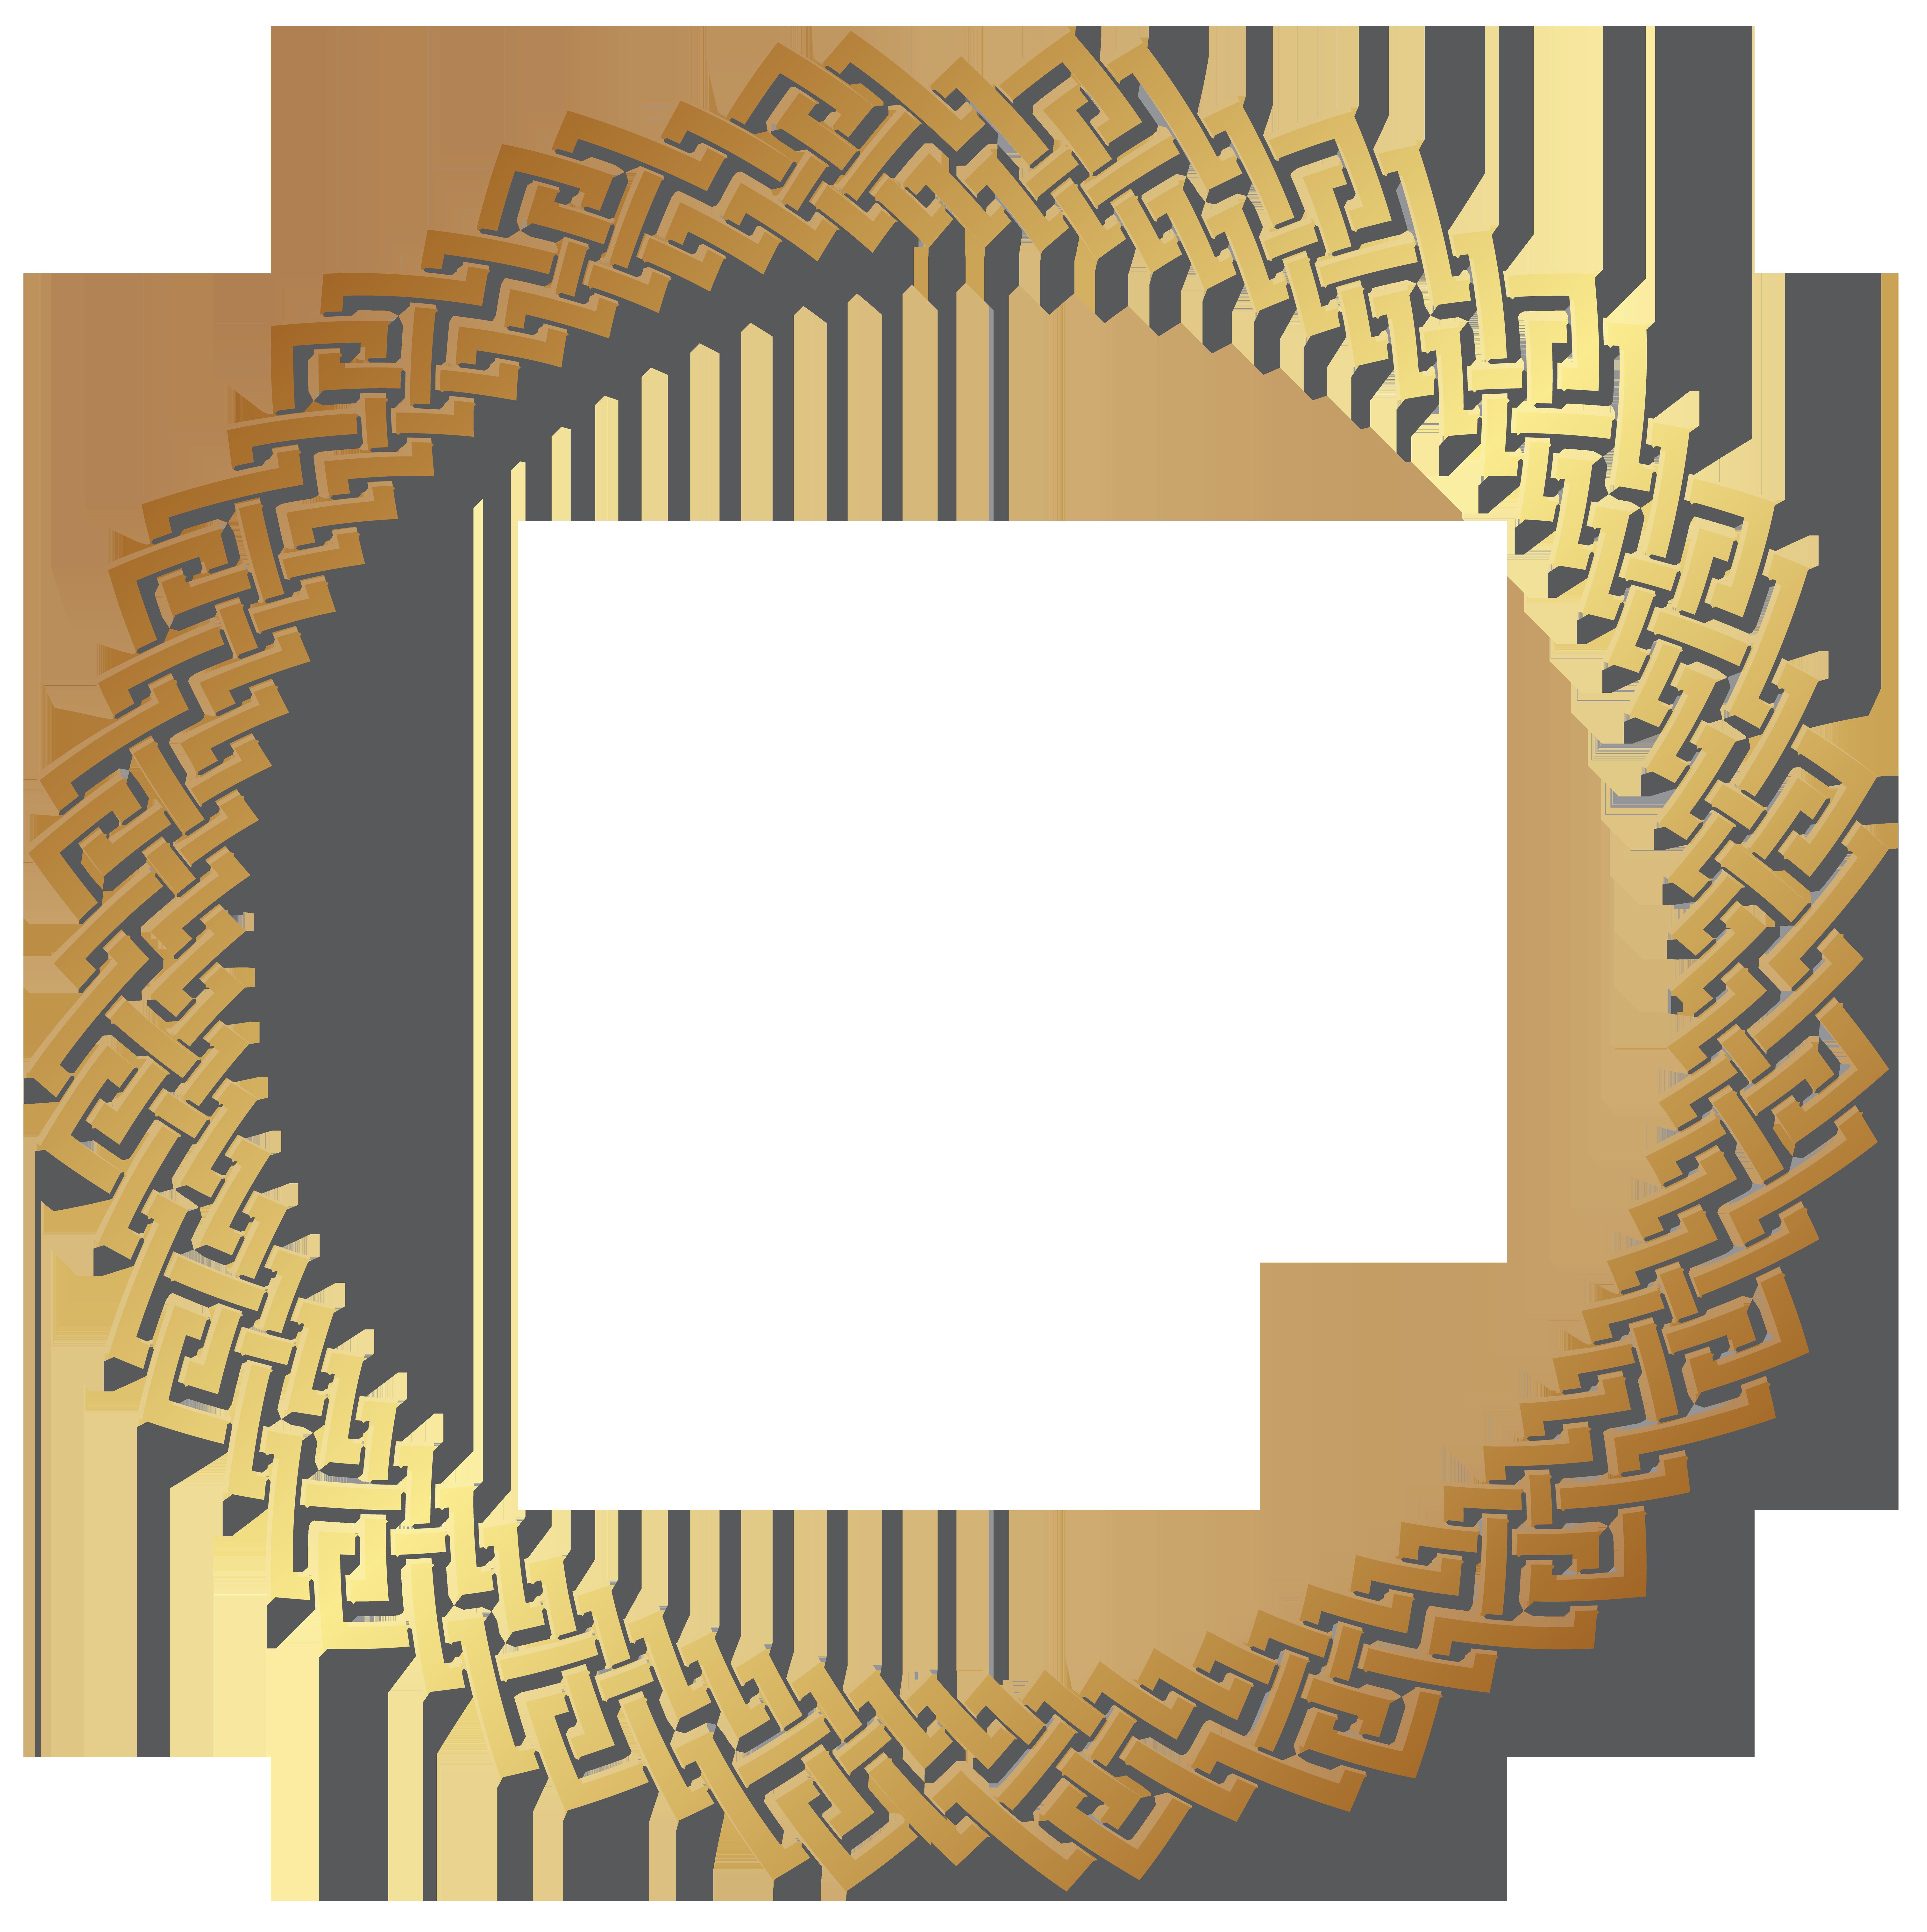 7979x8000 Round Golden Border Frame Transparent Png Clip Artu200b Gallery